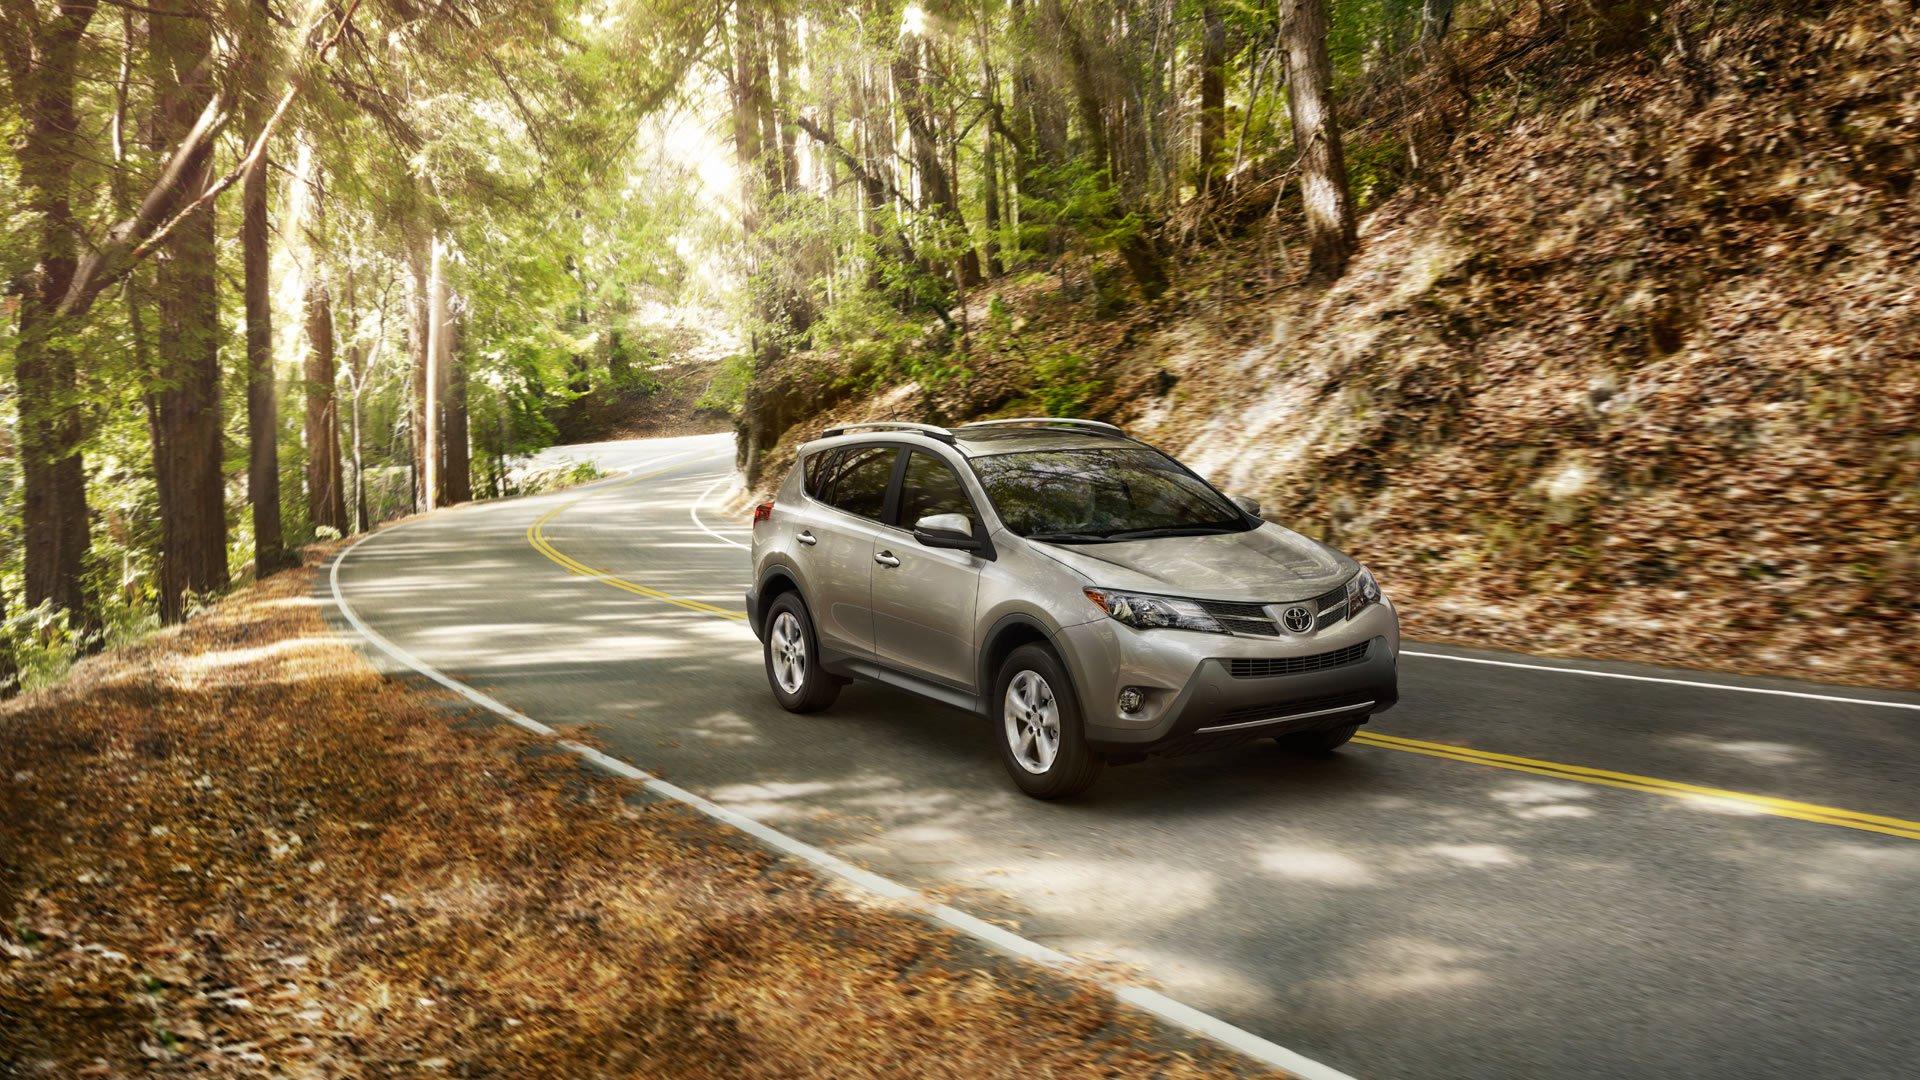 Toyota Dealer Serving Cedar Falls IA Sales Lease Specials - Where is the nearest toyota dealership